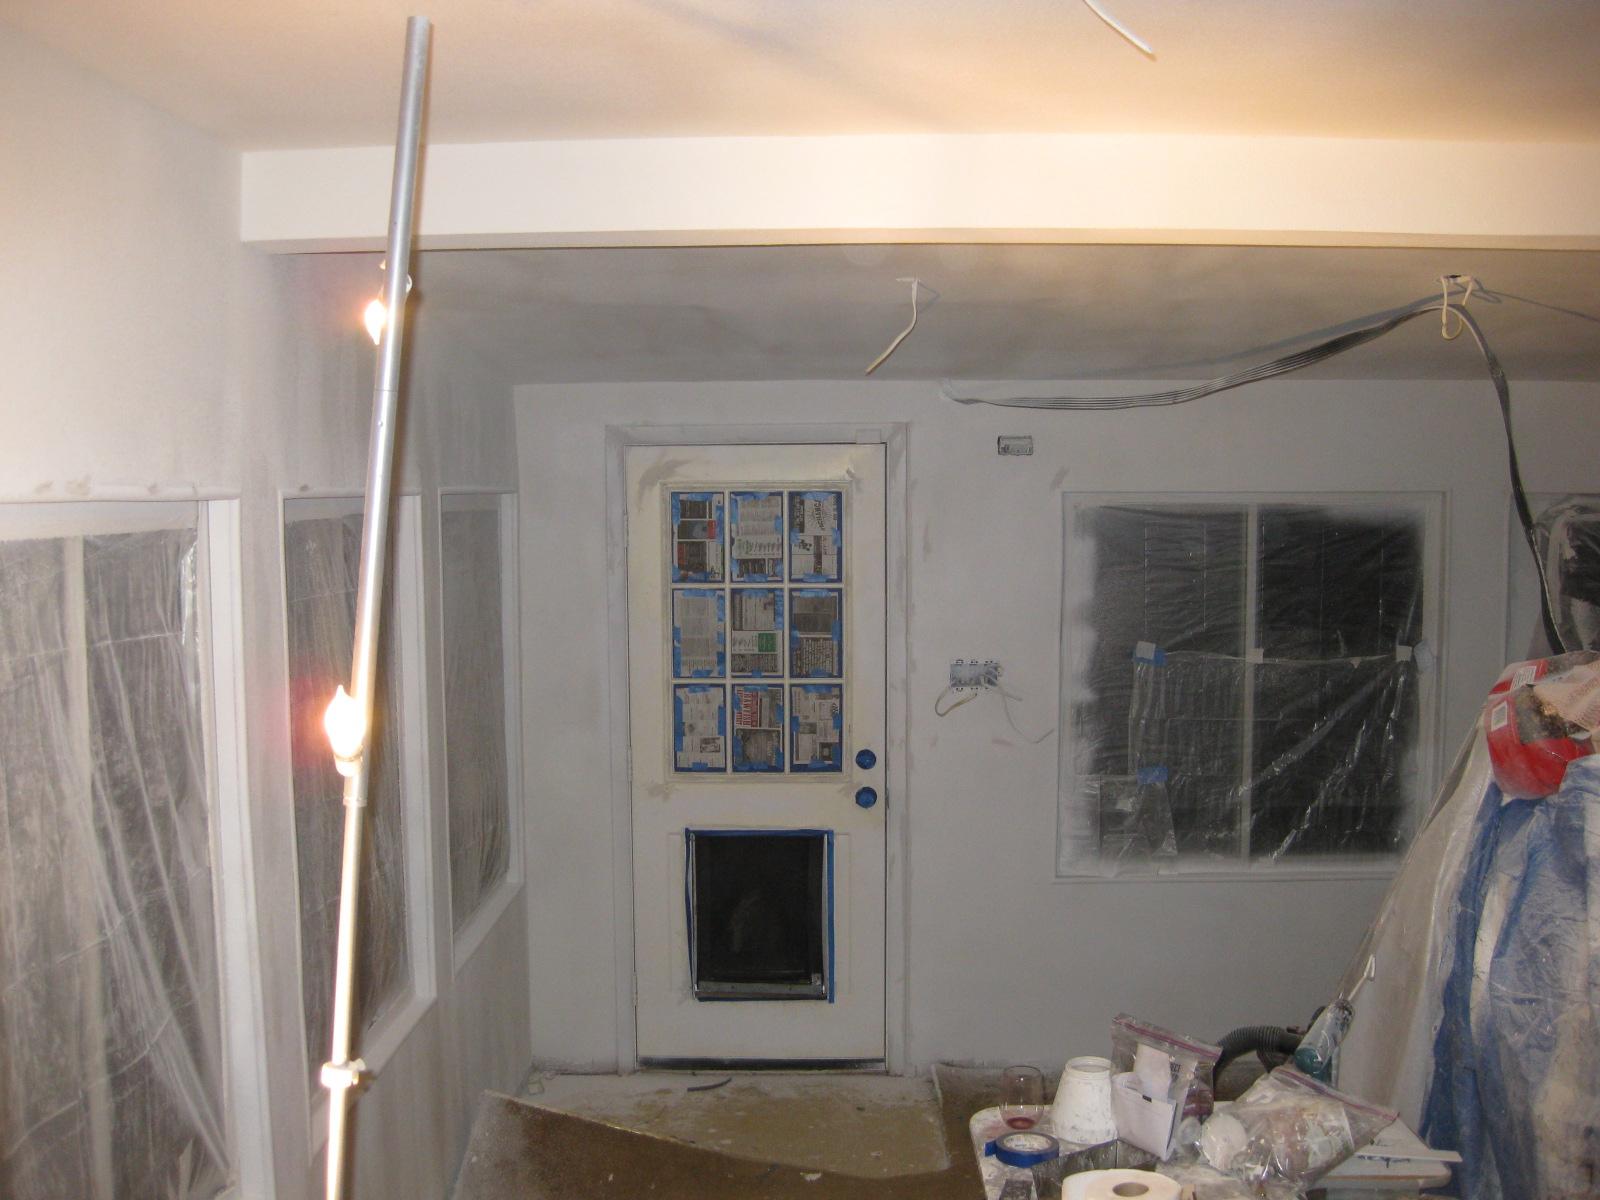 Dog Room - Drywall & Ceiling